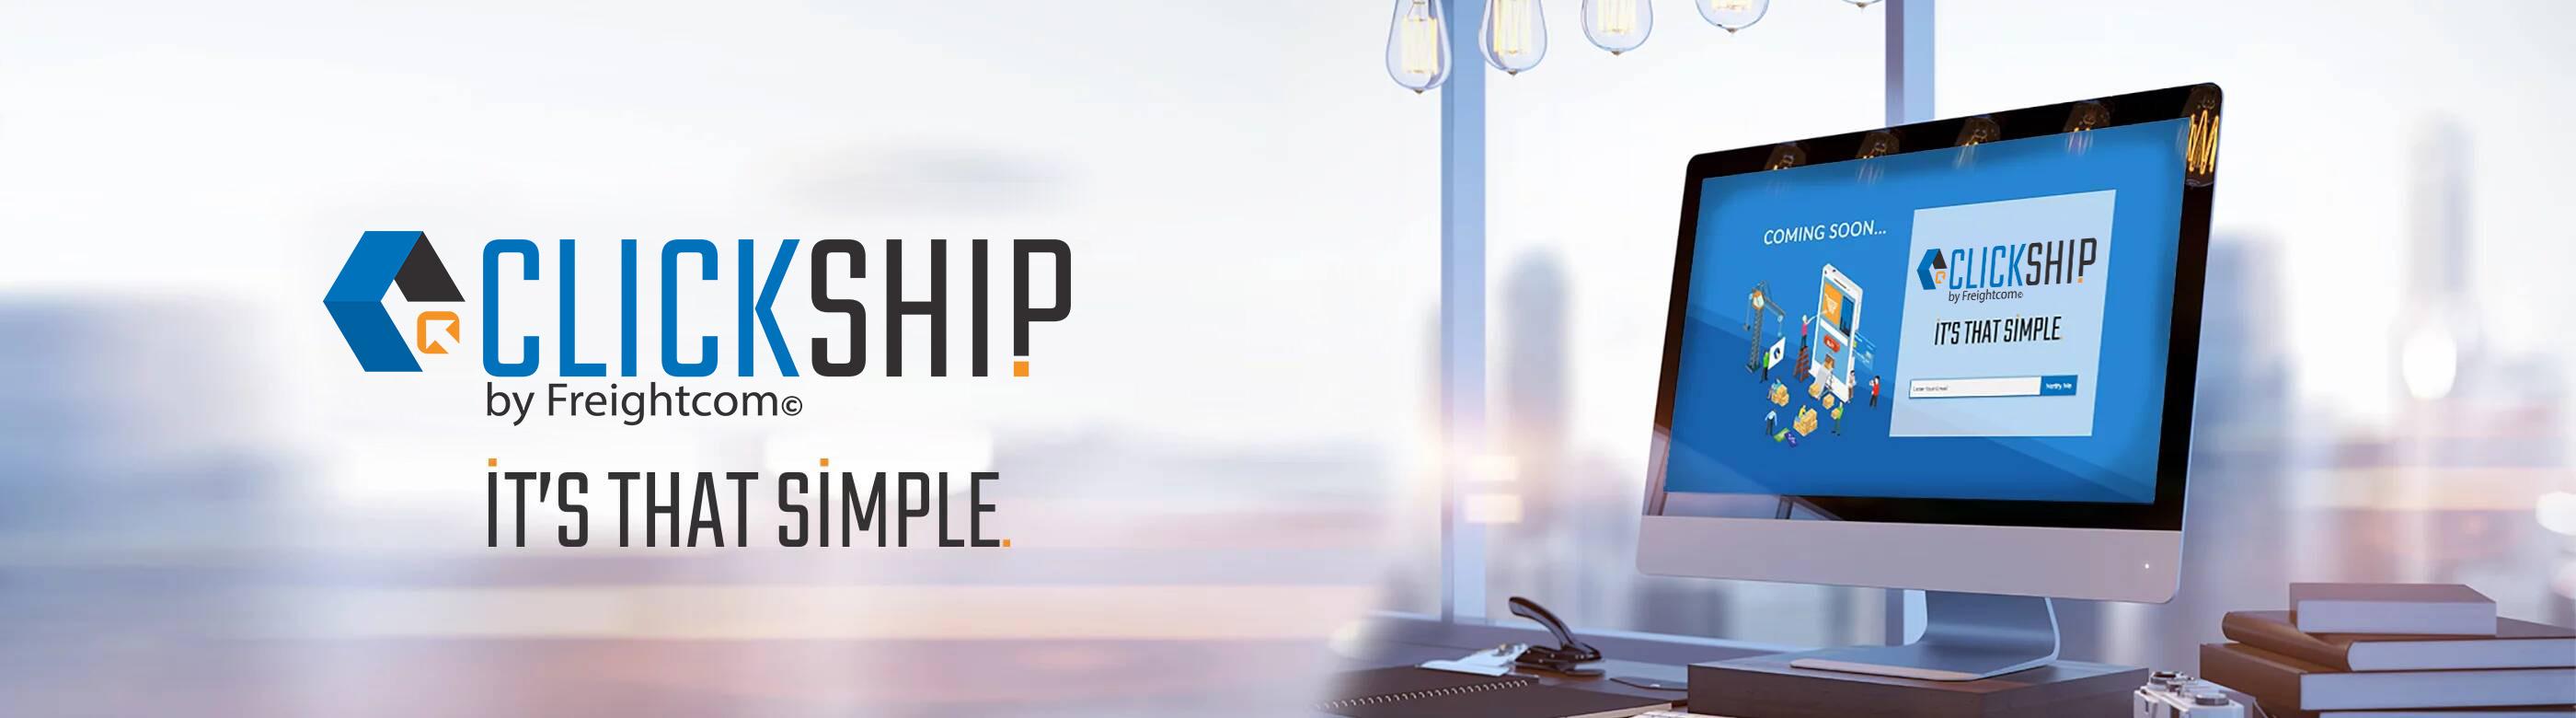 ClickShip By Freightcom